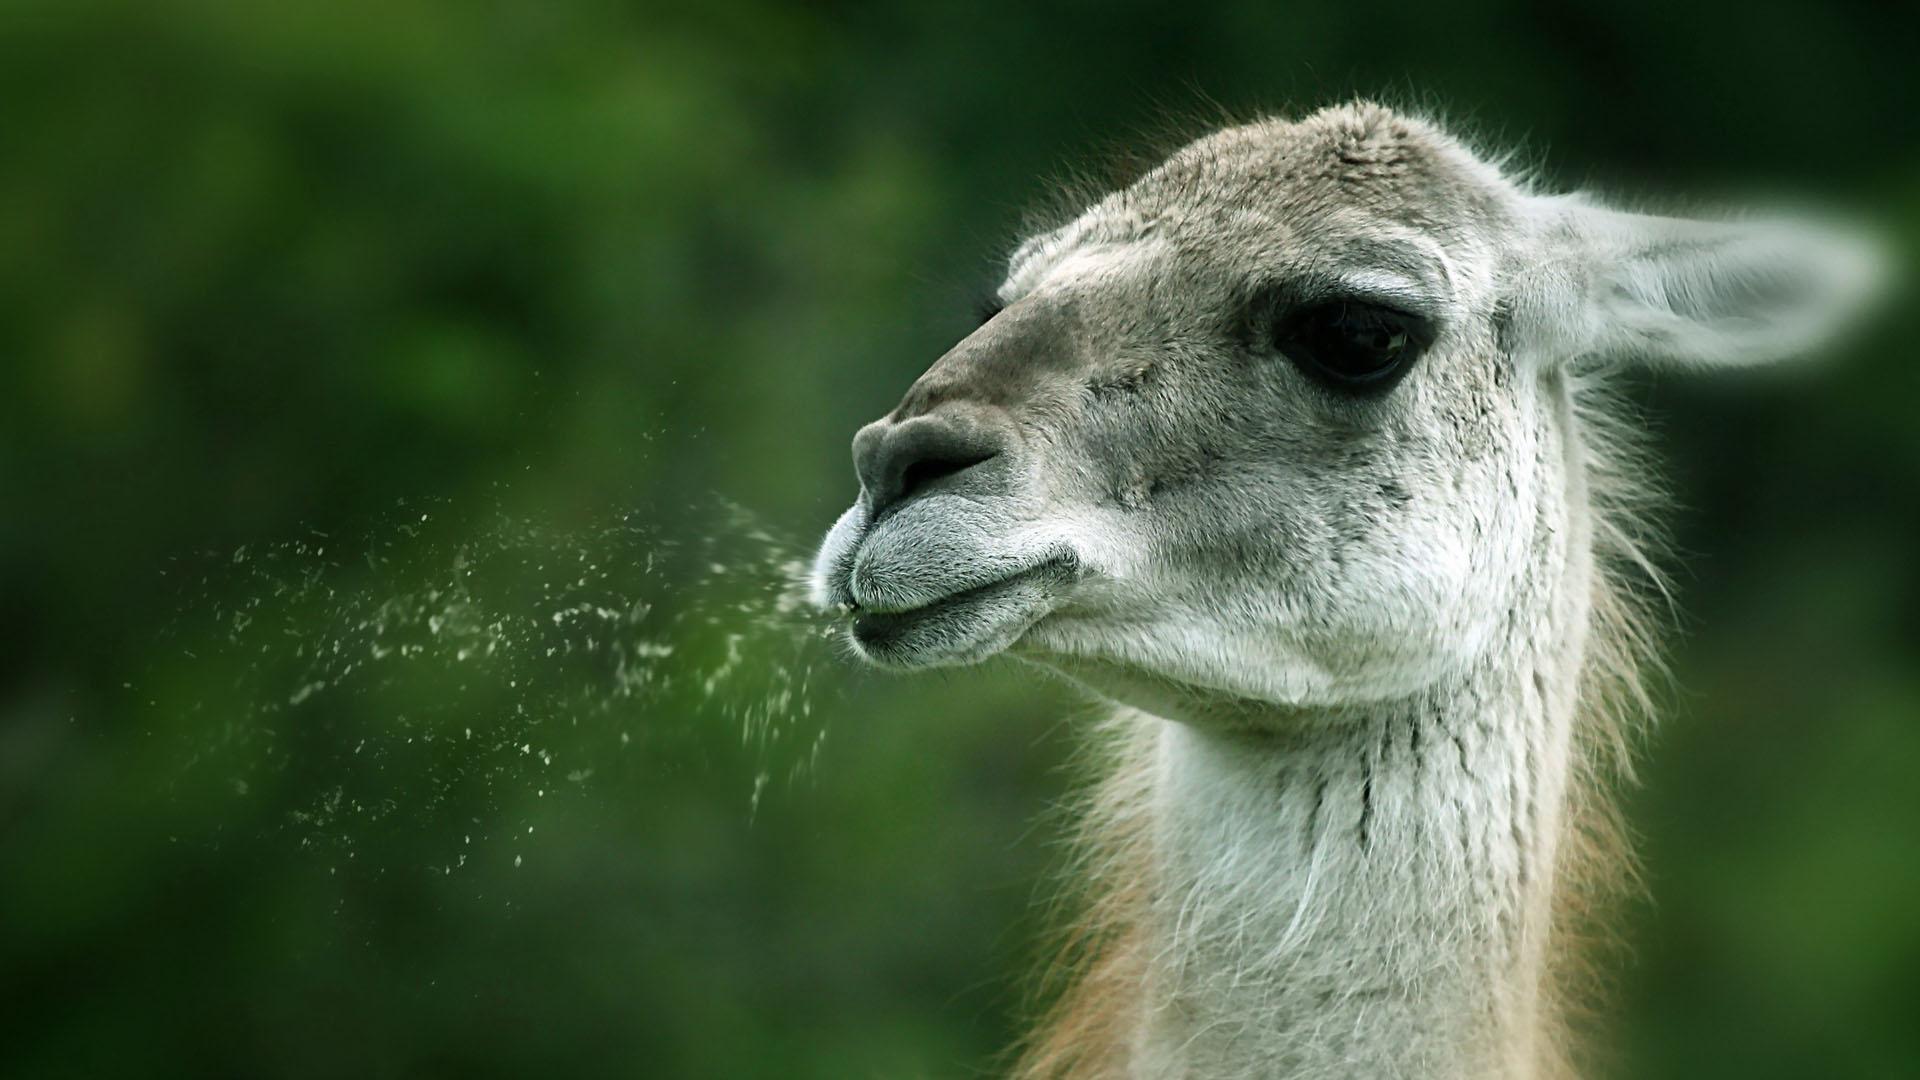 Funny-Spitting-llama